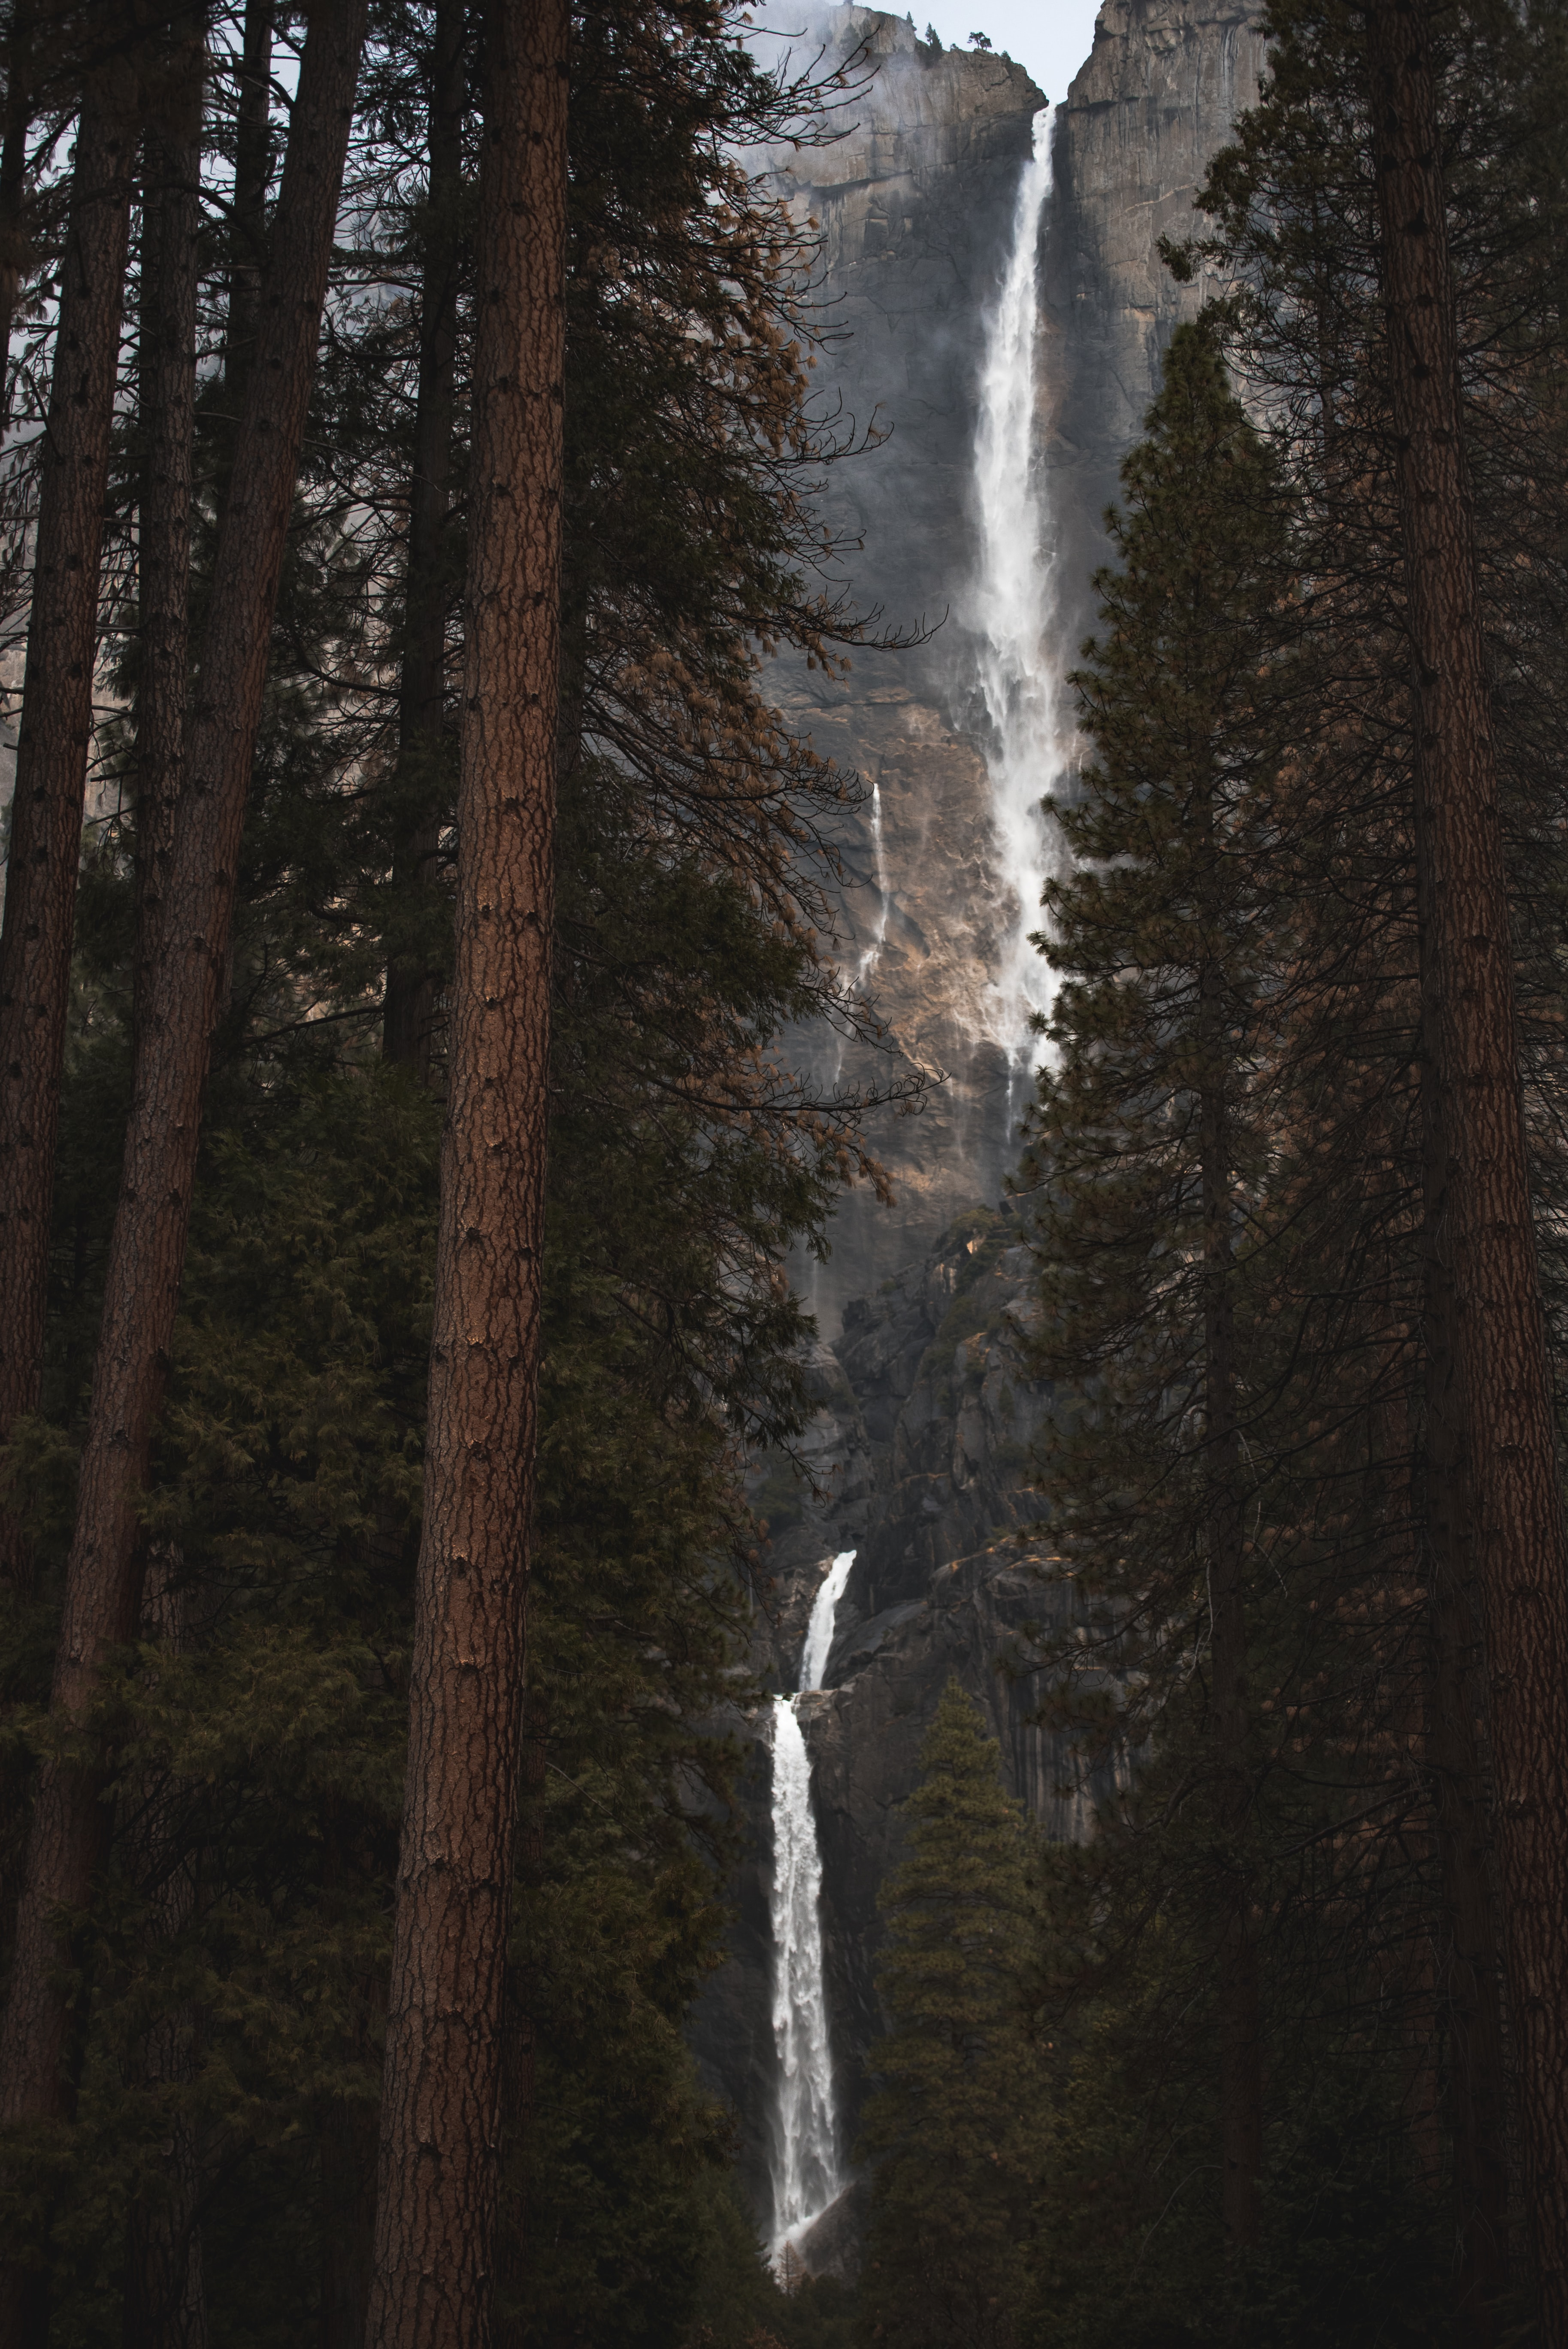 trees overlooking Angel Falls Venezuela at daytime